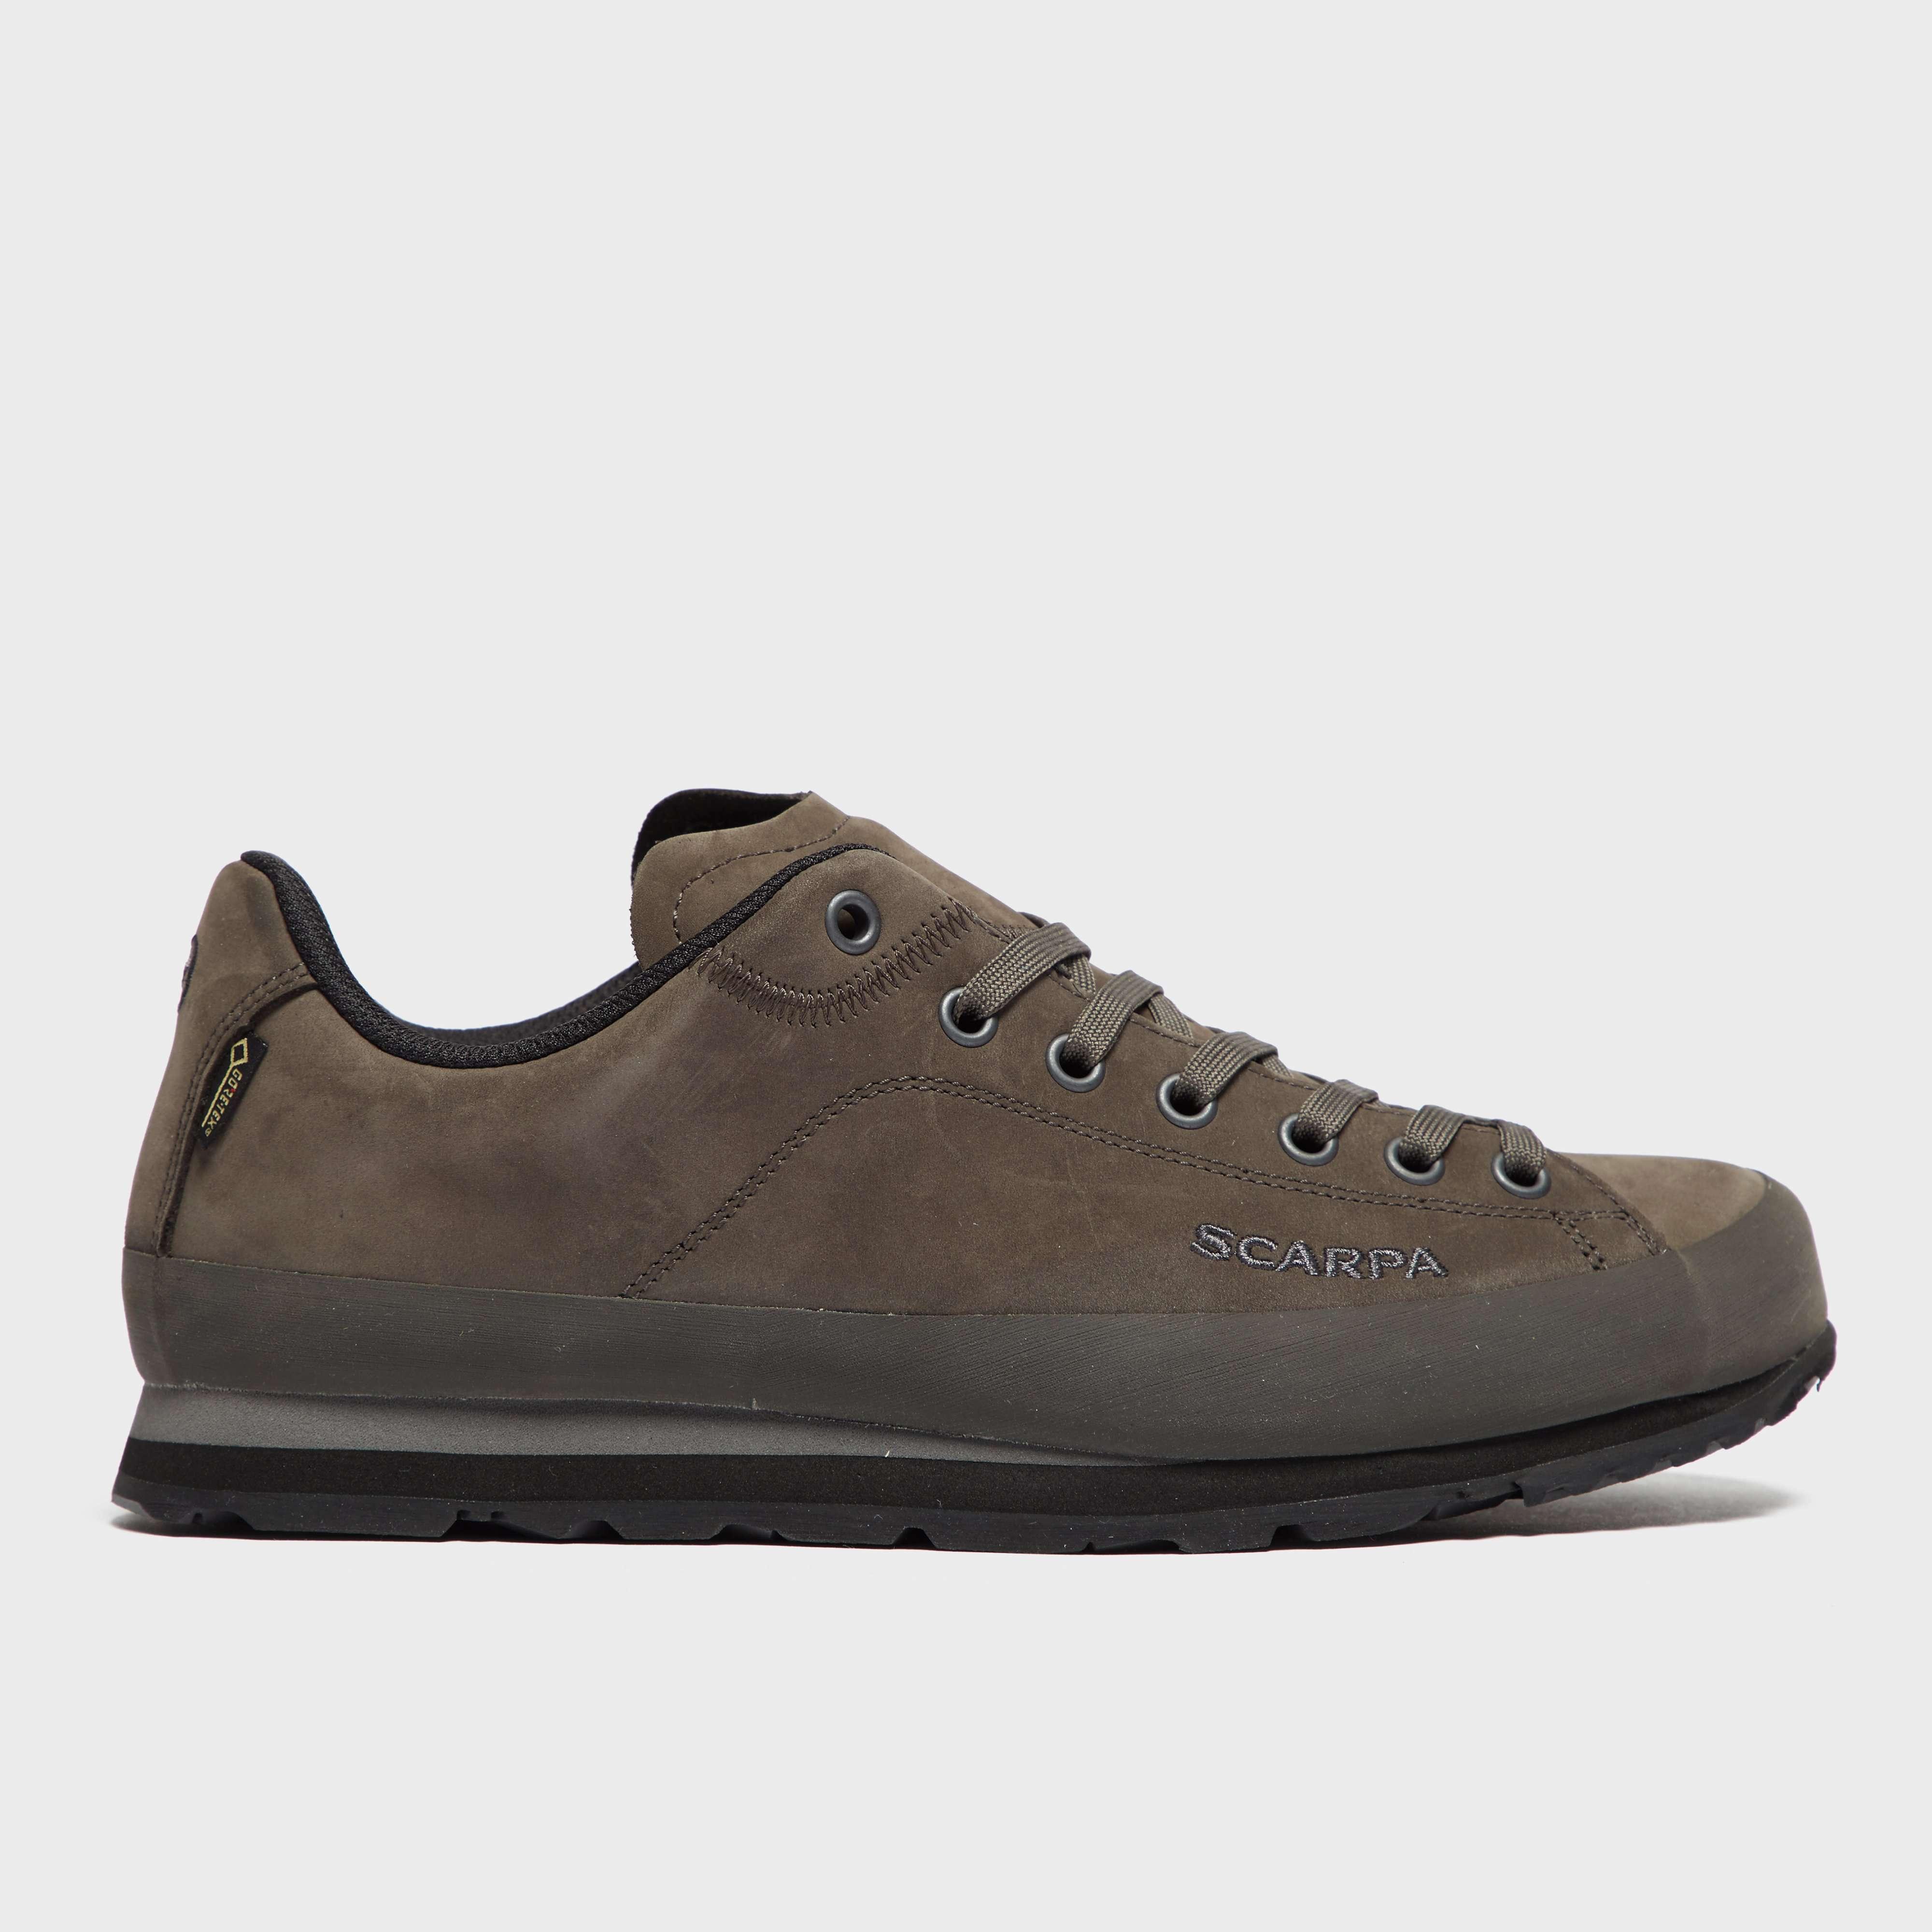 SCARPA Men's Margarita Gore-Tex Walking Shoe